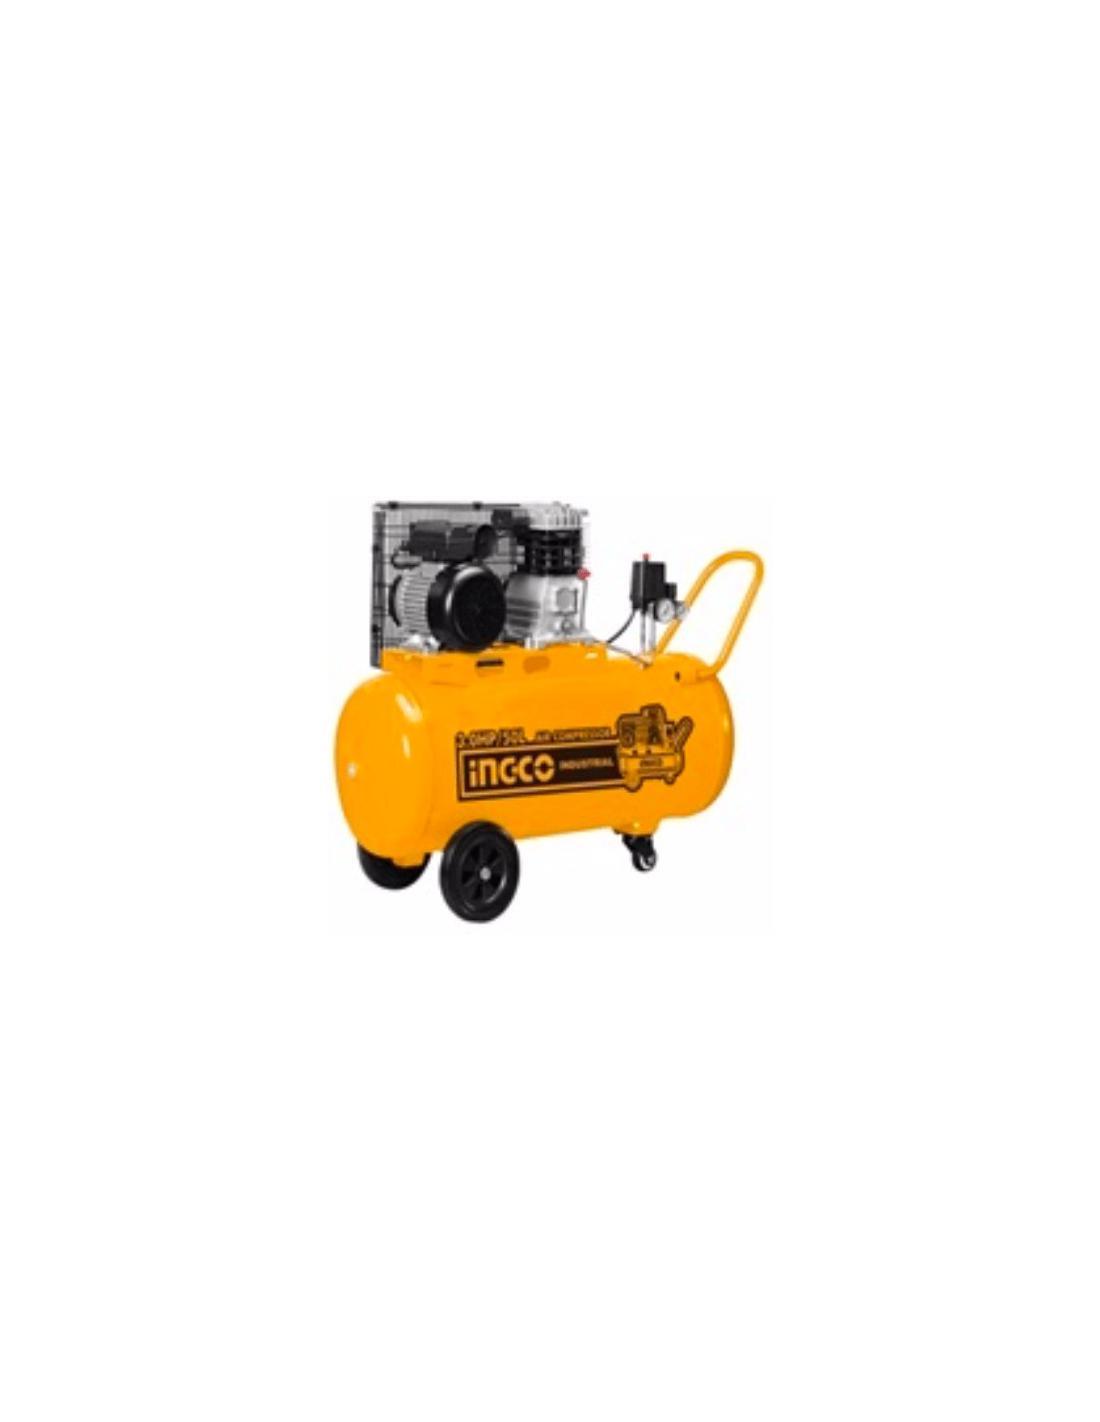 Compresseur INGCO 100L 220-240V~50Hz Power: 2.2 kW - 1